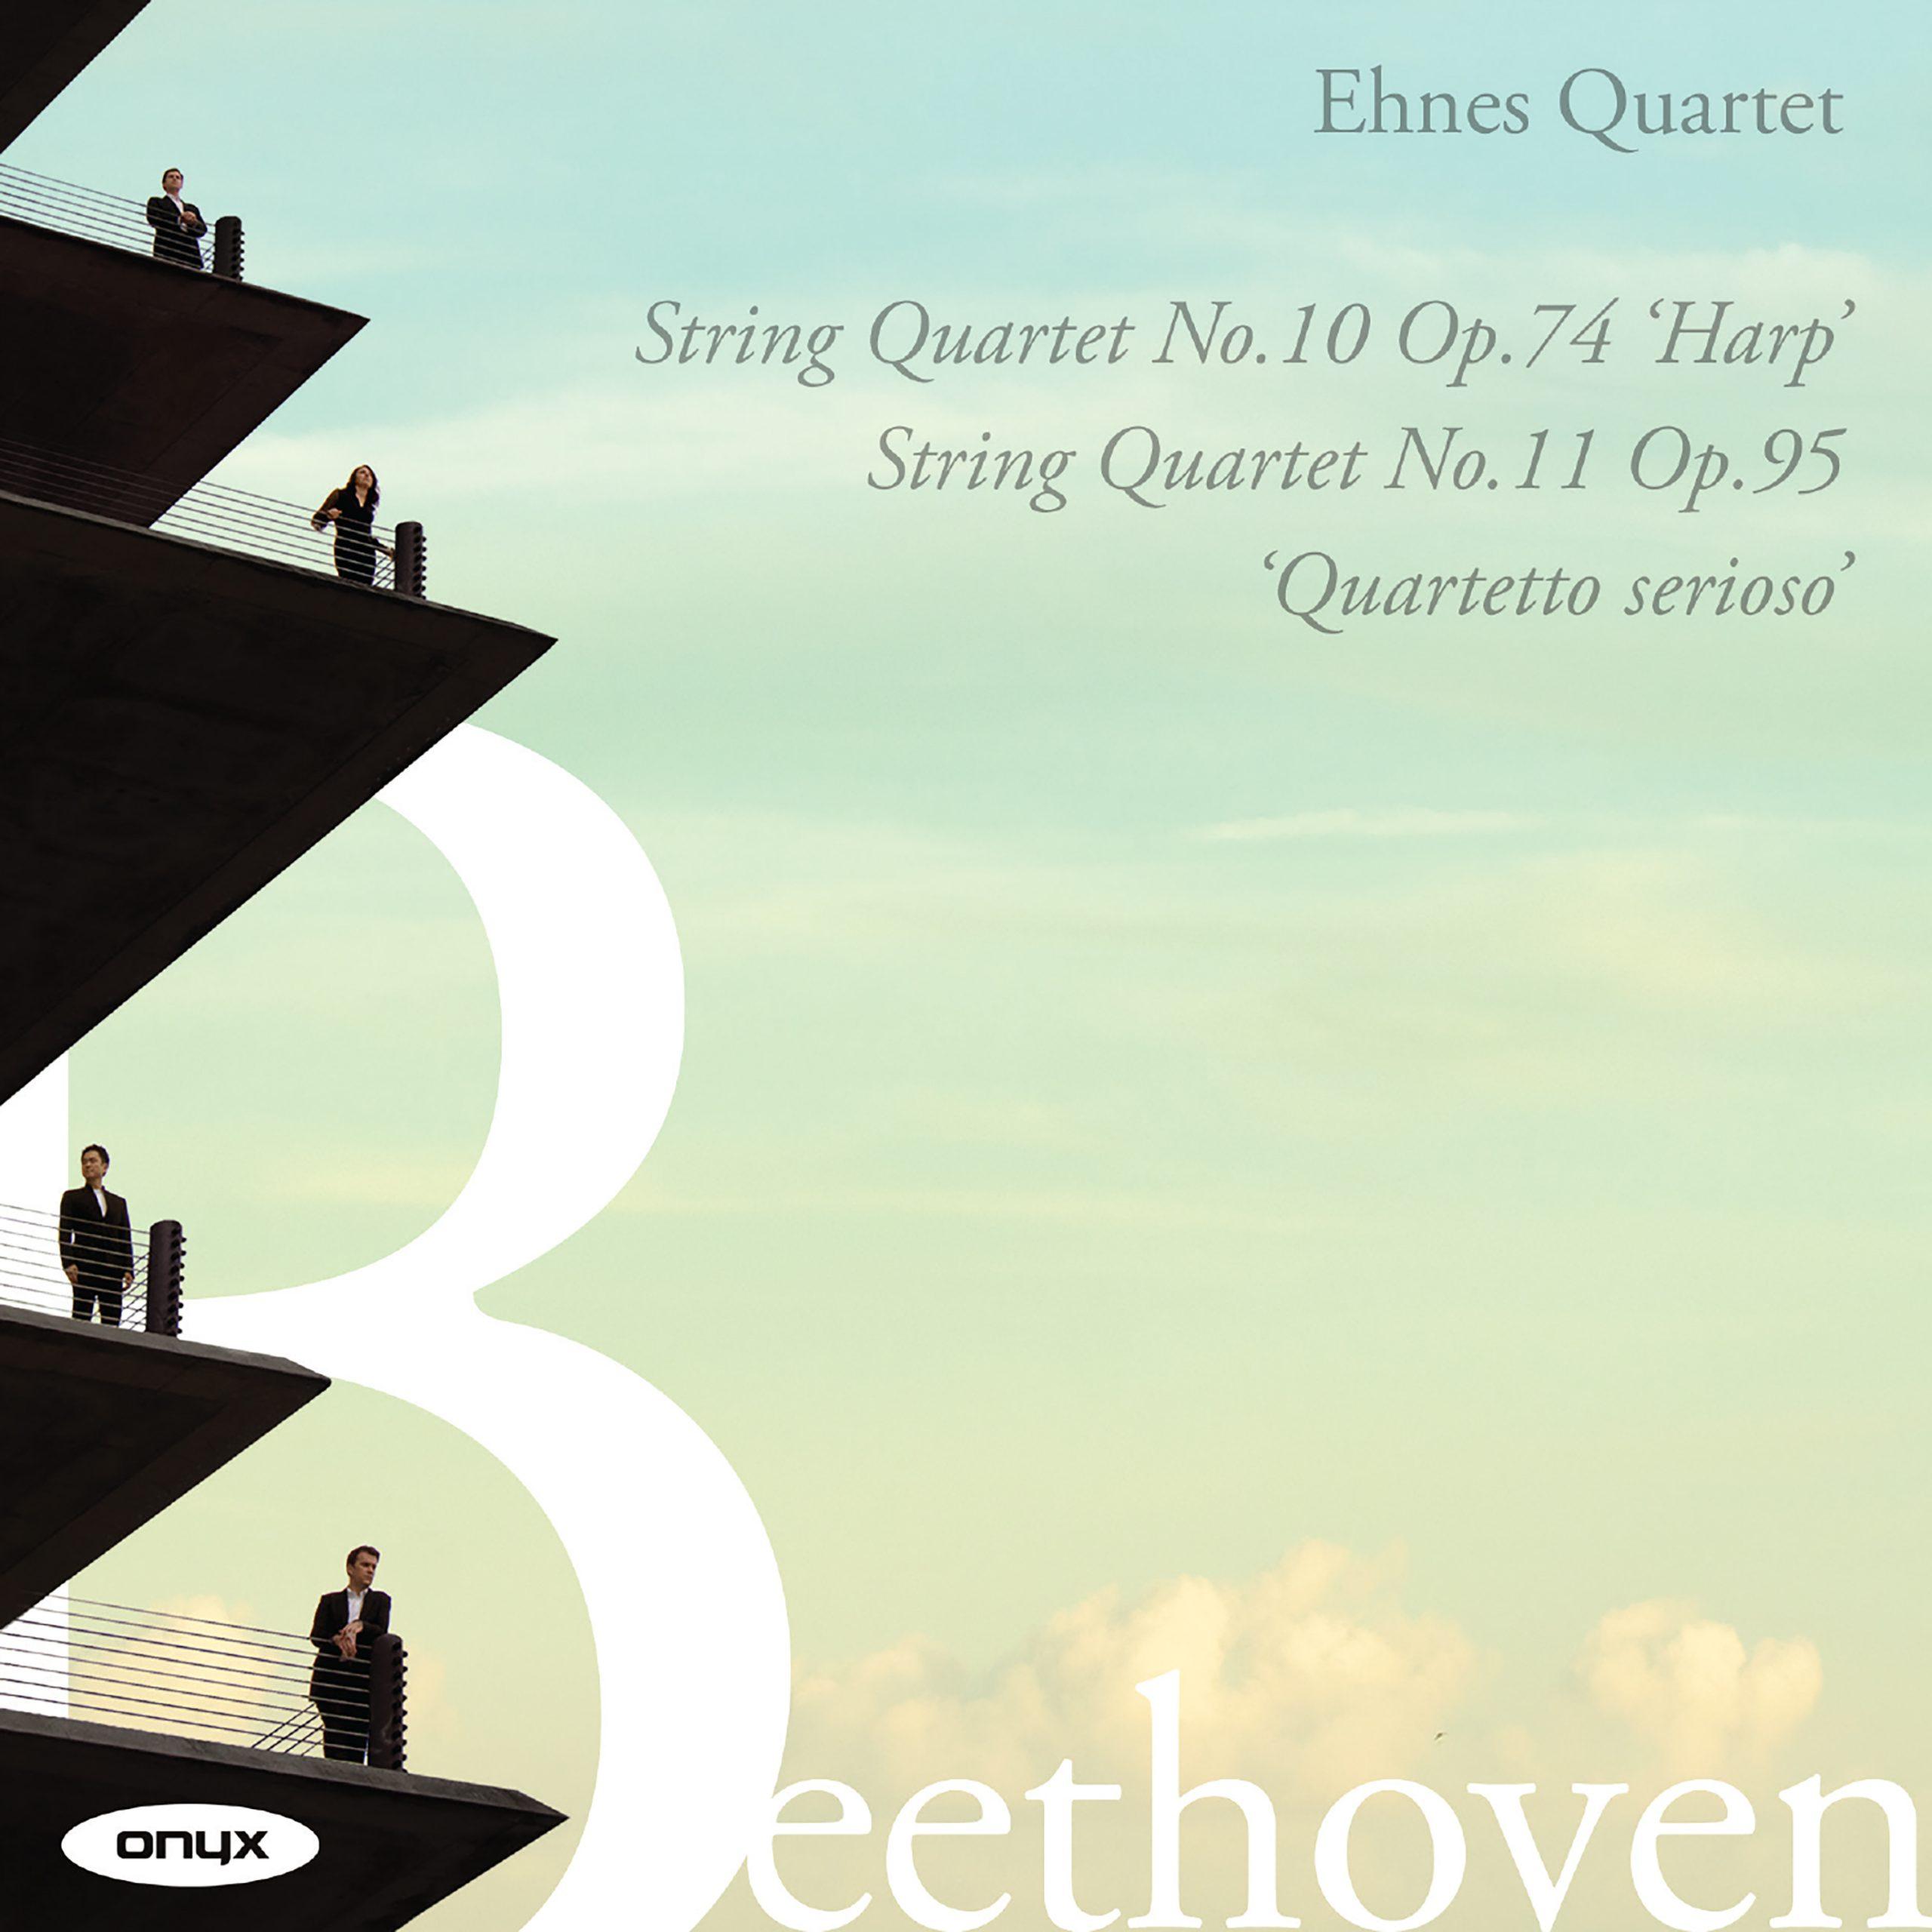 Beethoven: String Quartet No.10 Op.74 'Harp', String Quartet No.11 Op.95 'Serioso'